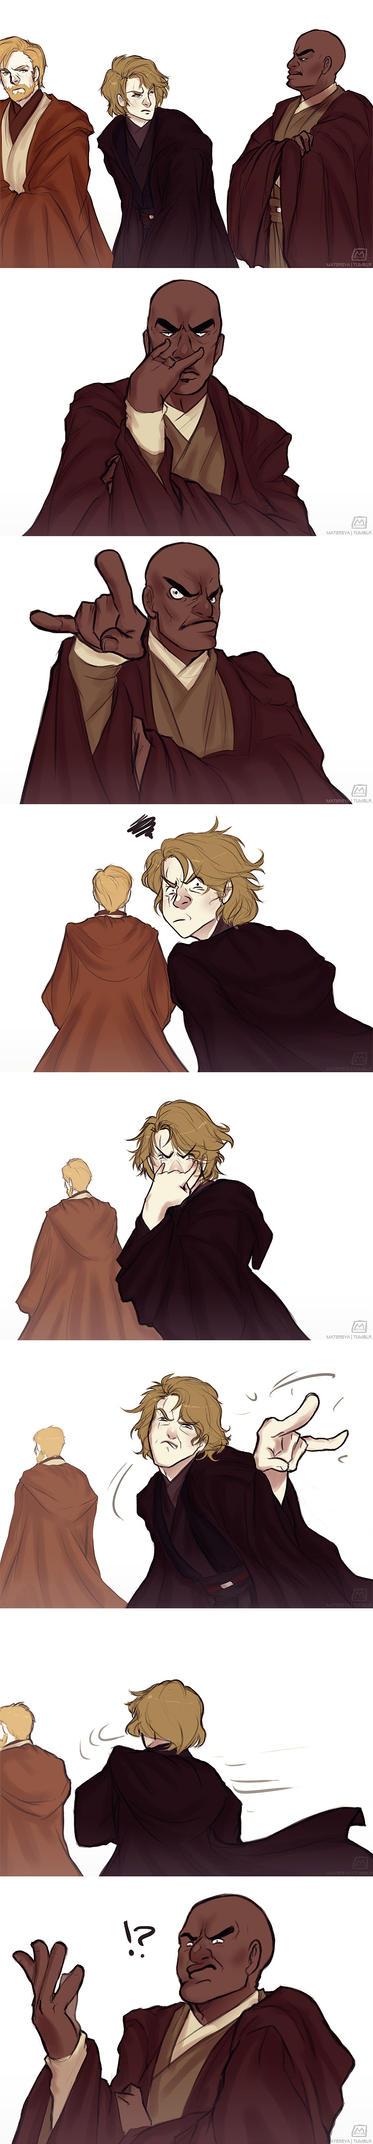 I've got my eyes on you, Skywalker by Matereya